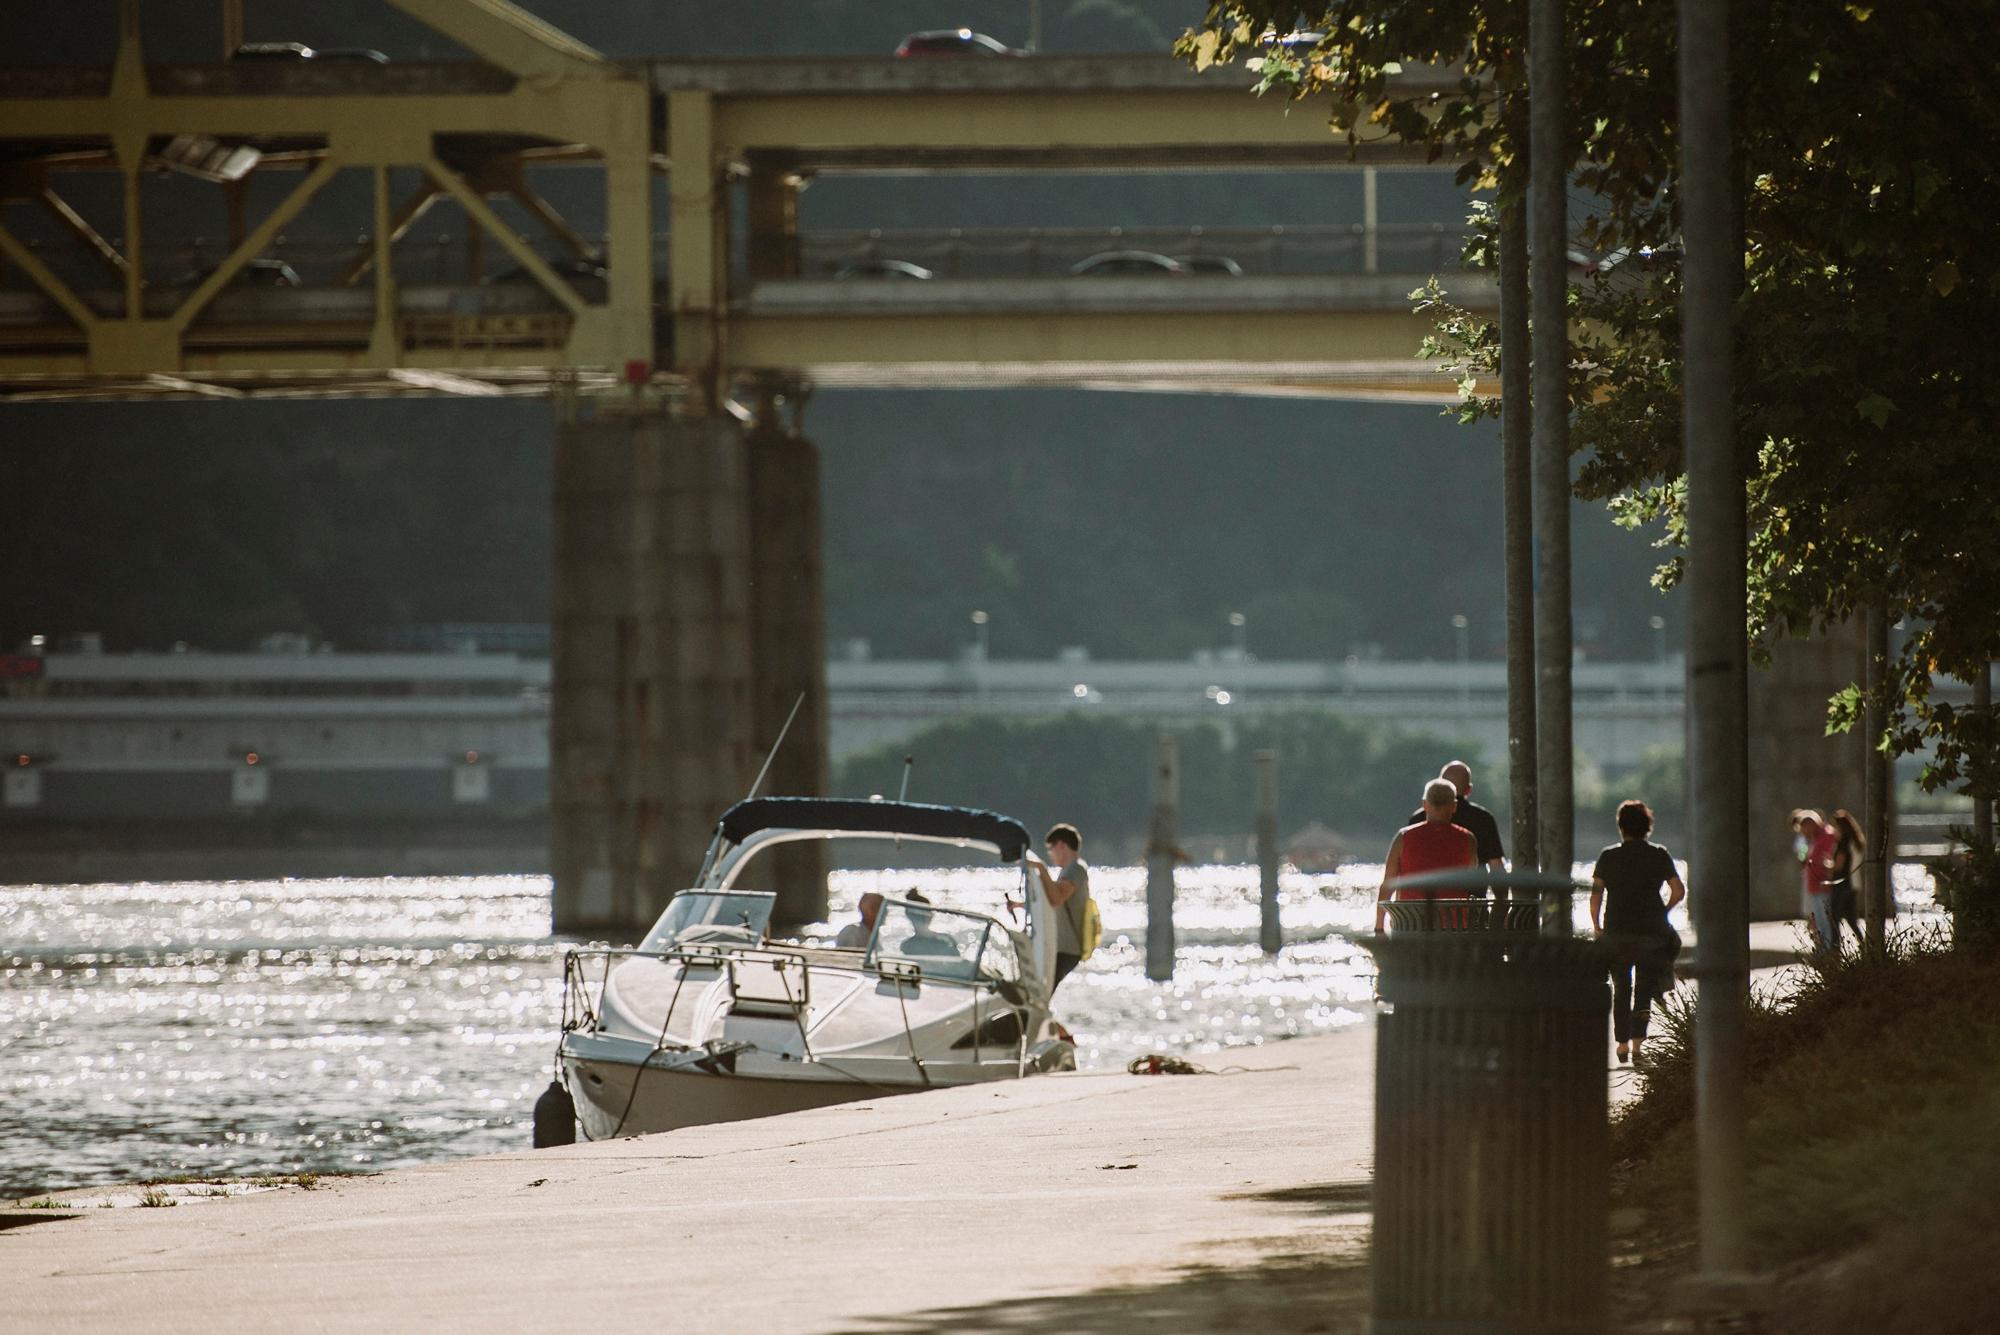 0102Jorge-Clara-Proposal-Pittsburgh_Proposal-Pittsburgh-Constructed-Adventures-Sandrachile.jpg